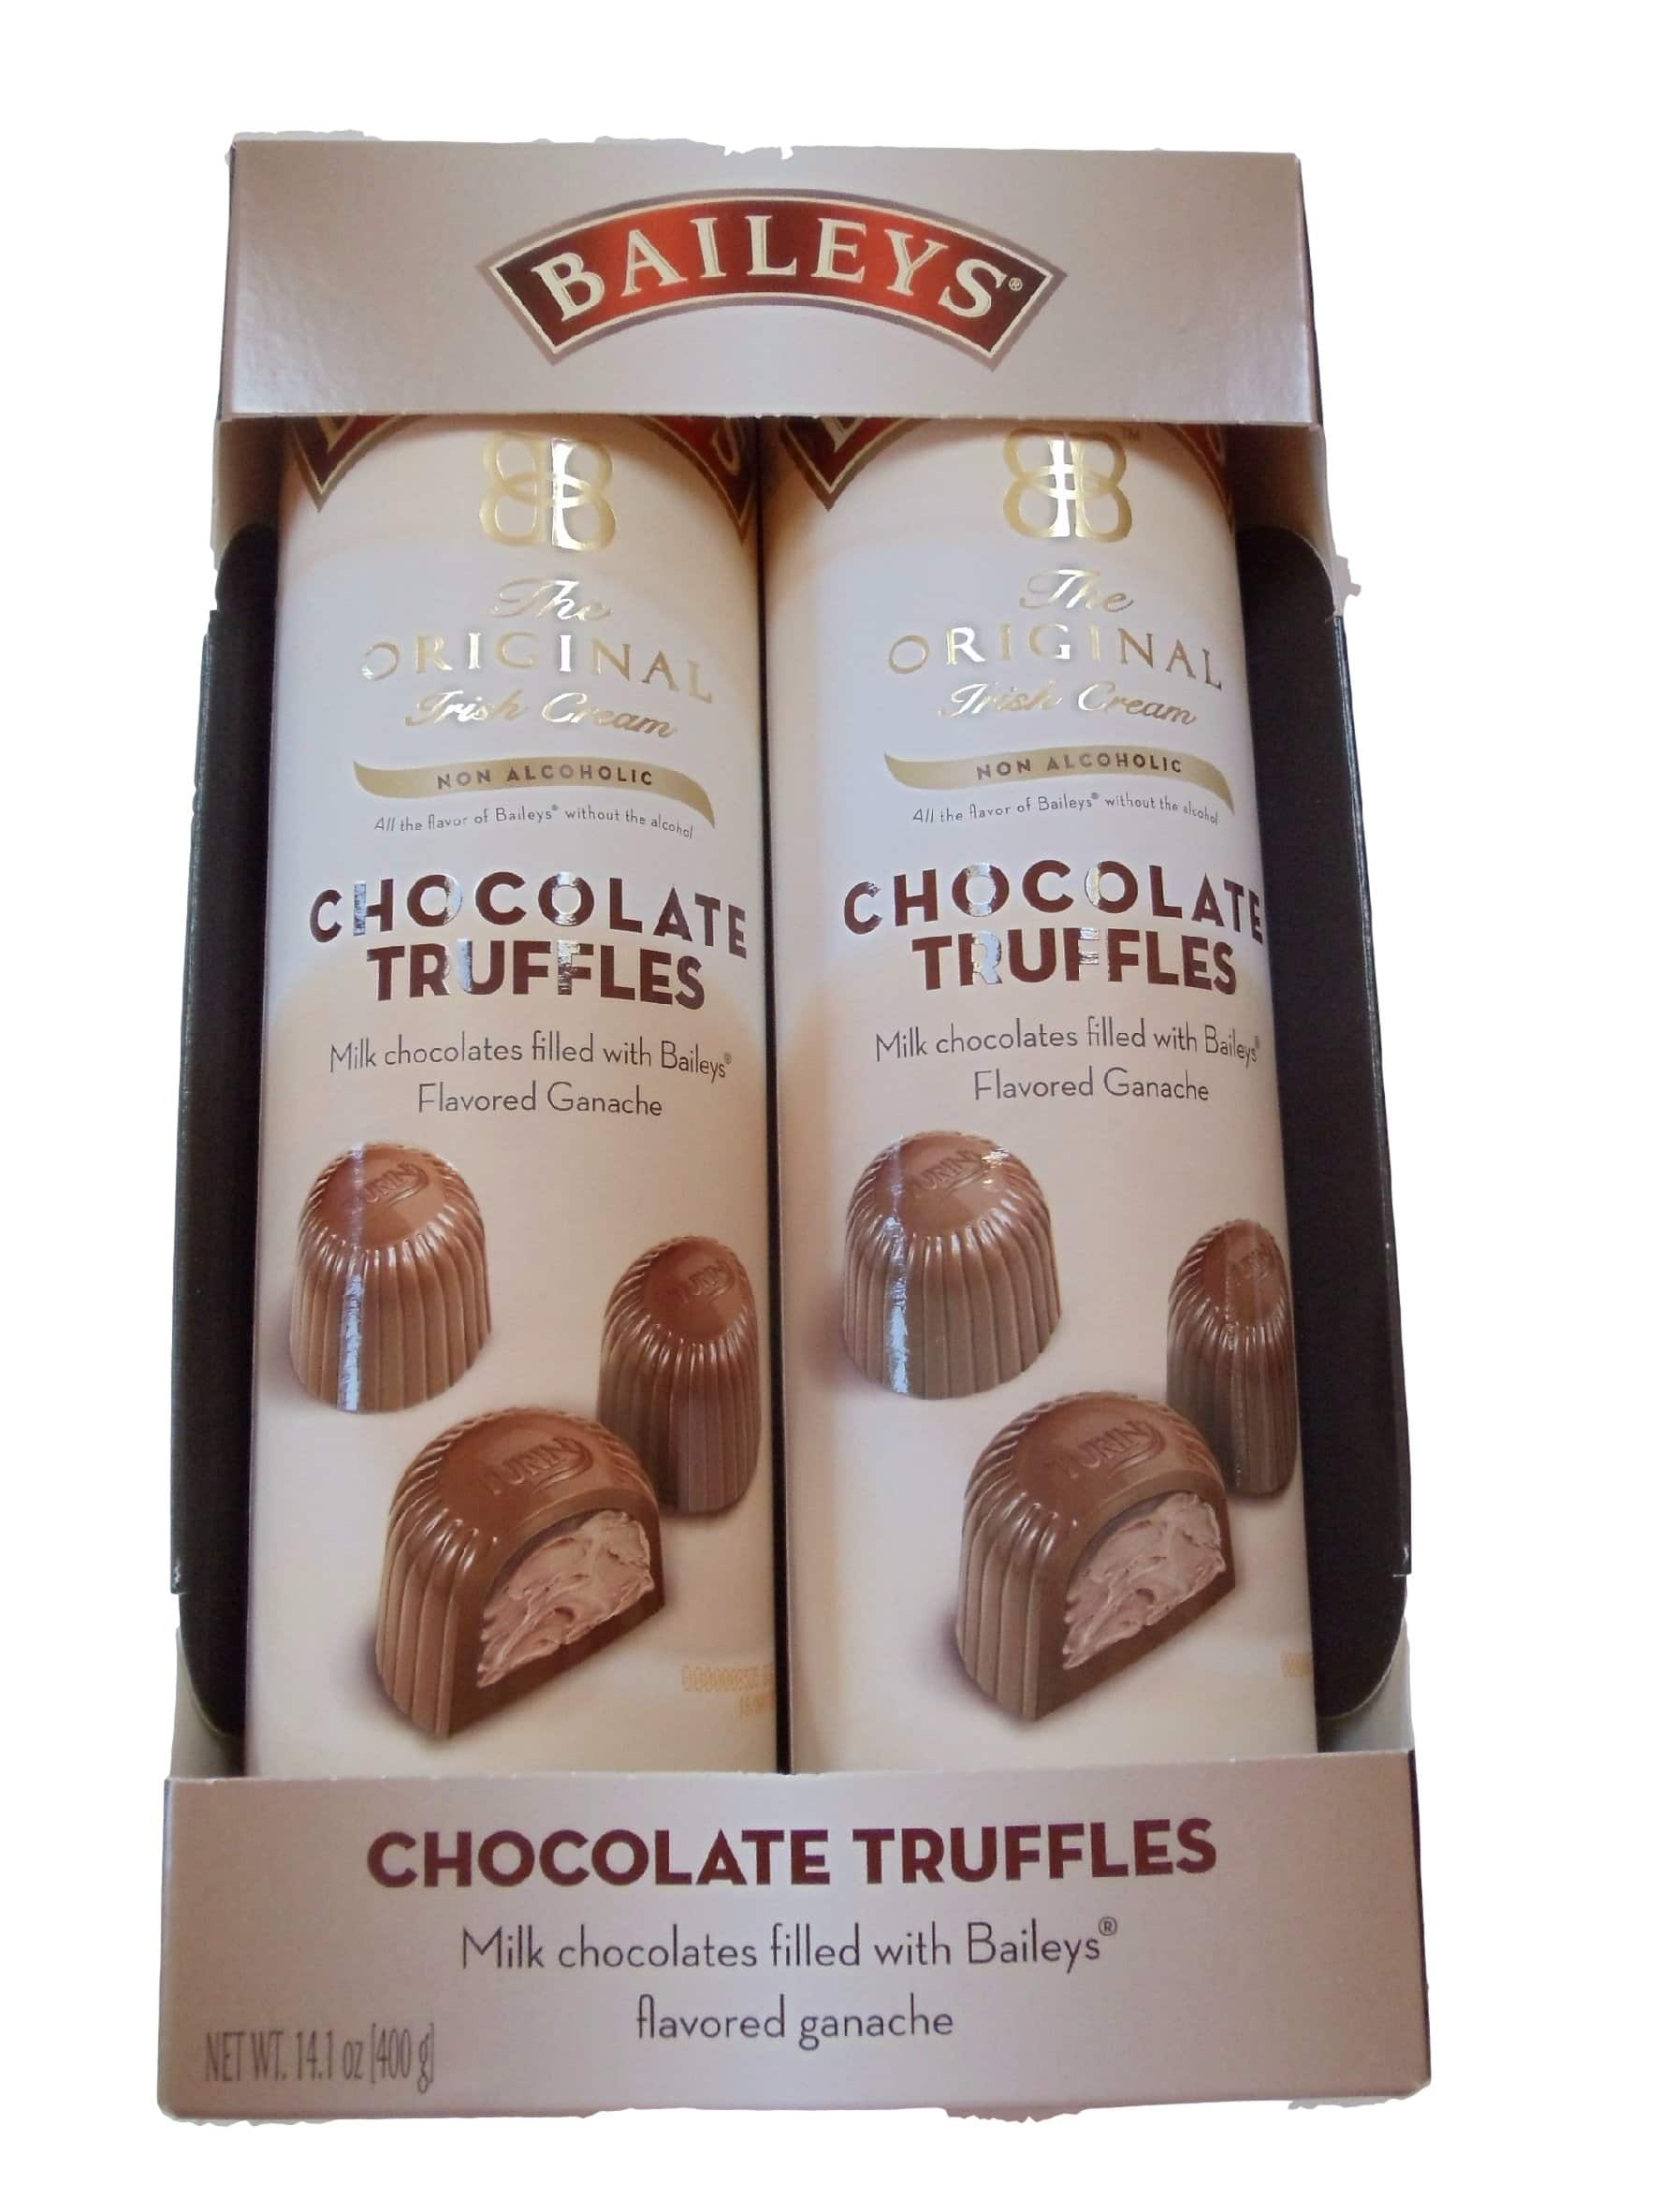 2-Ct of 17.6oz Baileys Original Irish Cream Non-Alcoholic Chocolate Truffles $19.54 + Free Shipping